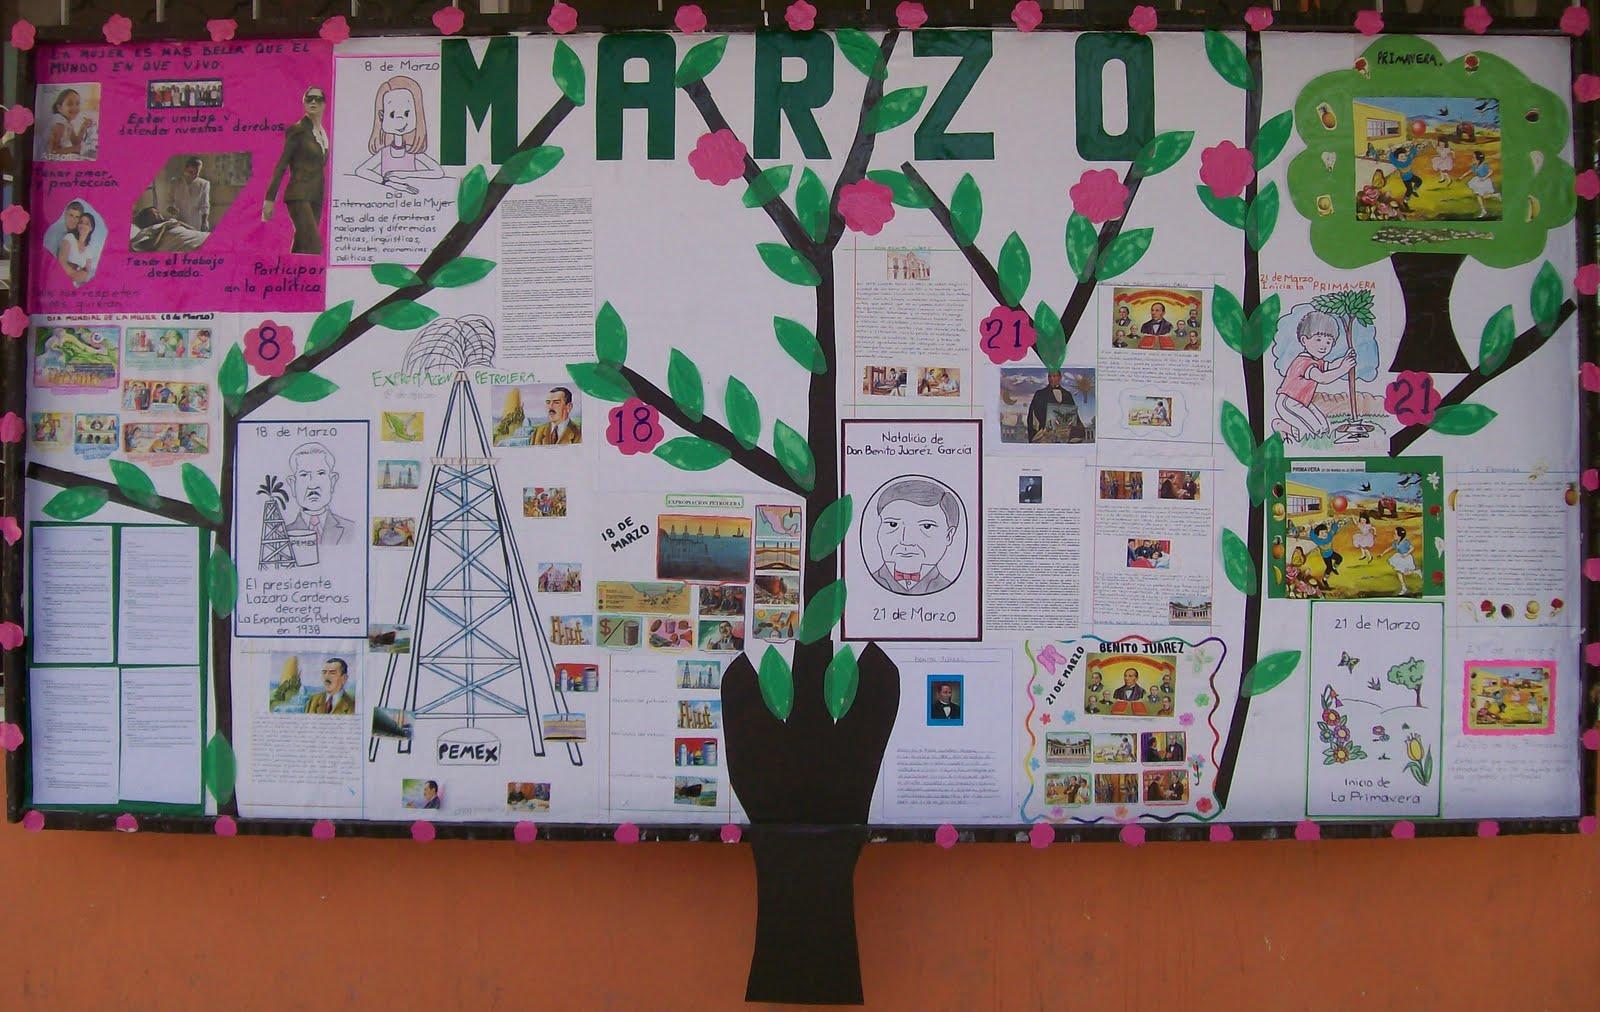 Peri dico mural marzo 8 imagenes educativas for Concepto de periodico mural